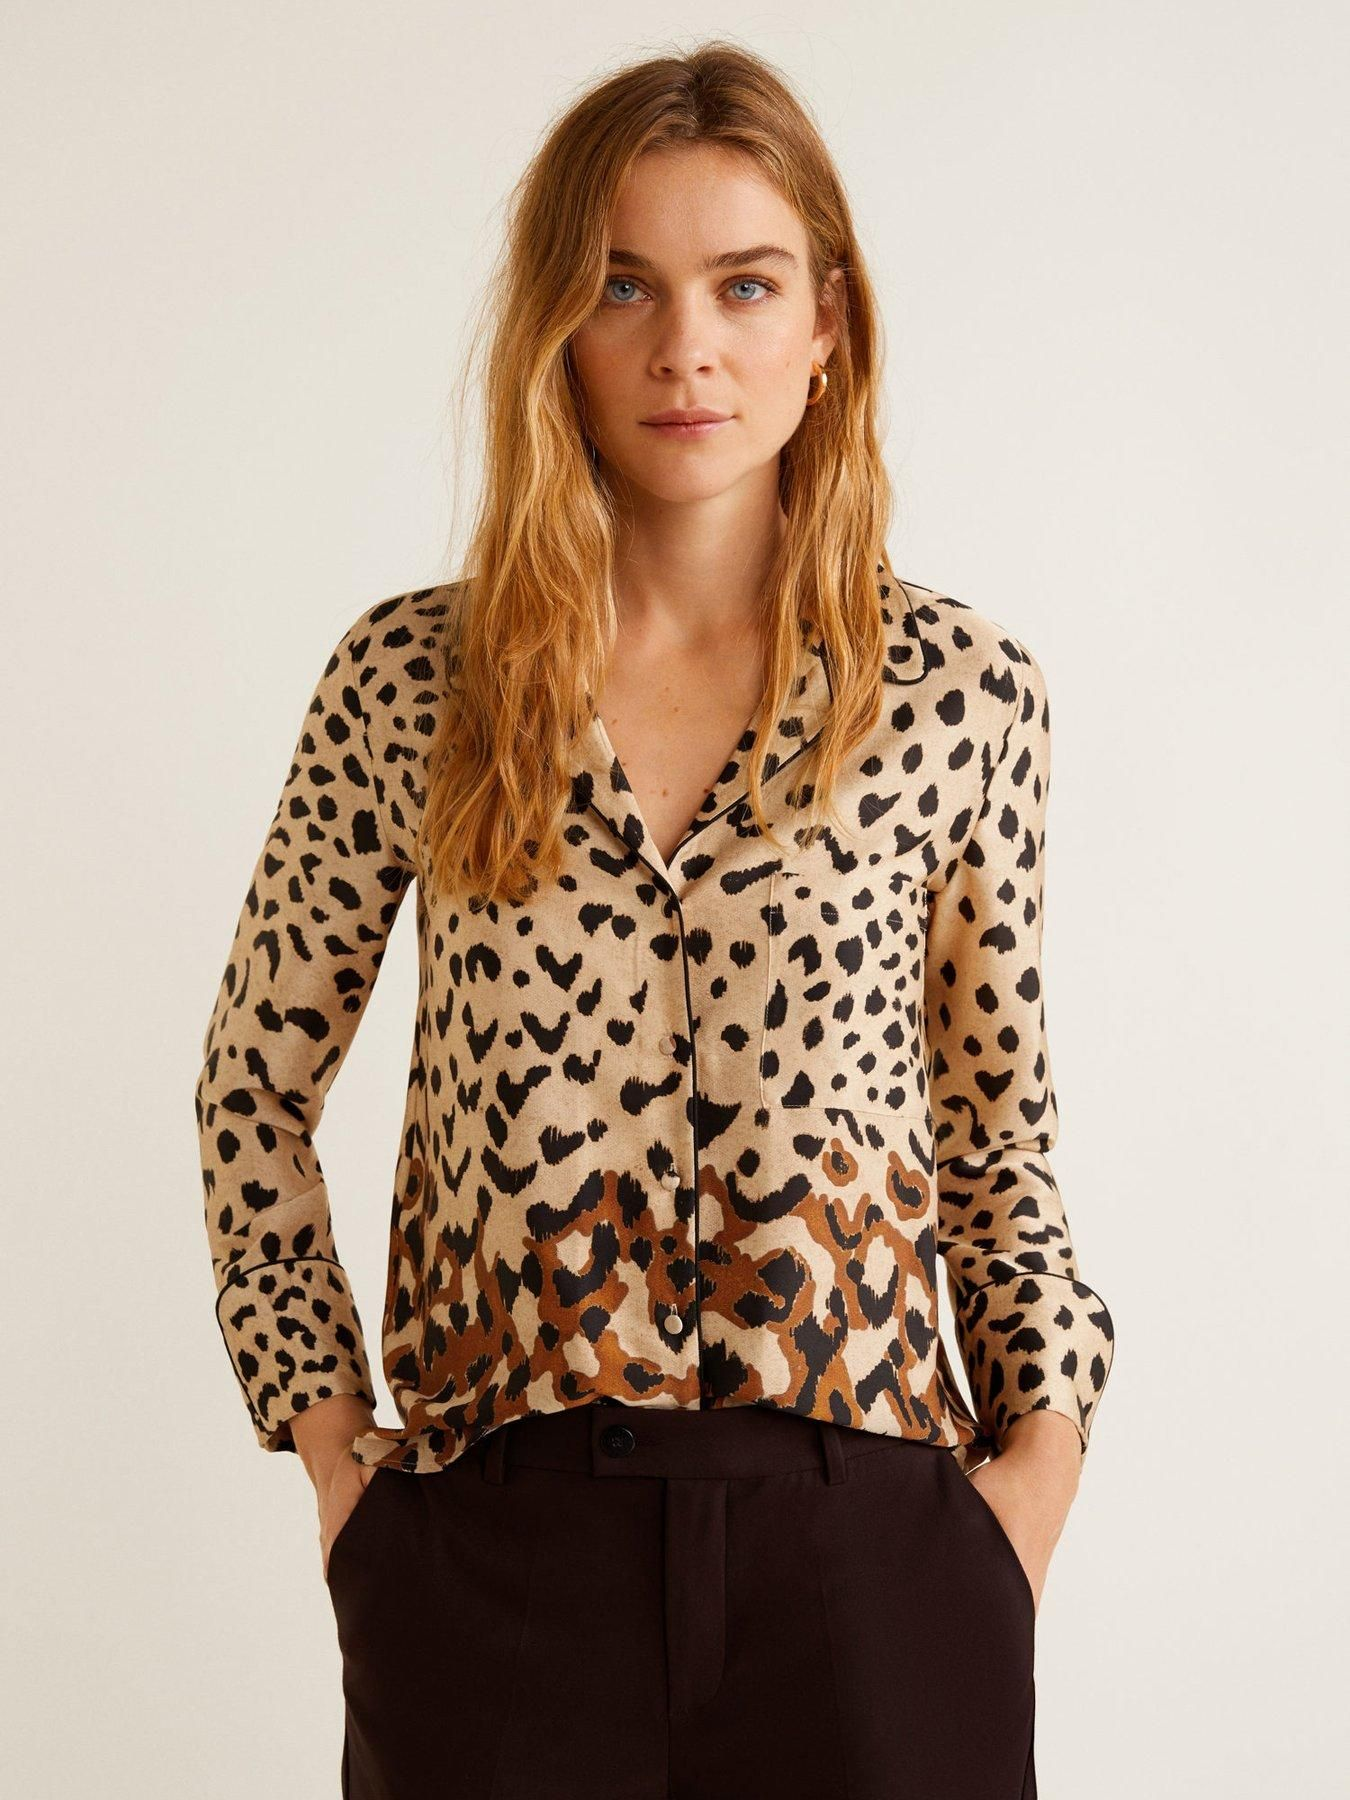 Littlewoods Ireland Online Shopping Fashion Homeware Print Shirts Women Leopard Print Shirt Fashion [ 1800 x 1350 Pixel ]